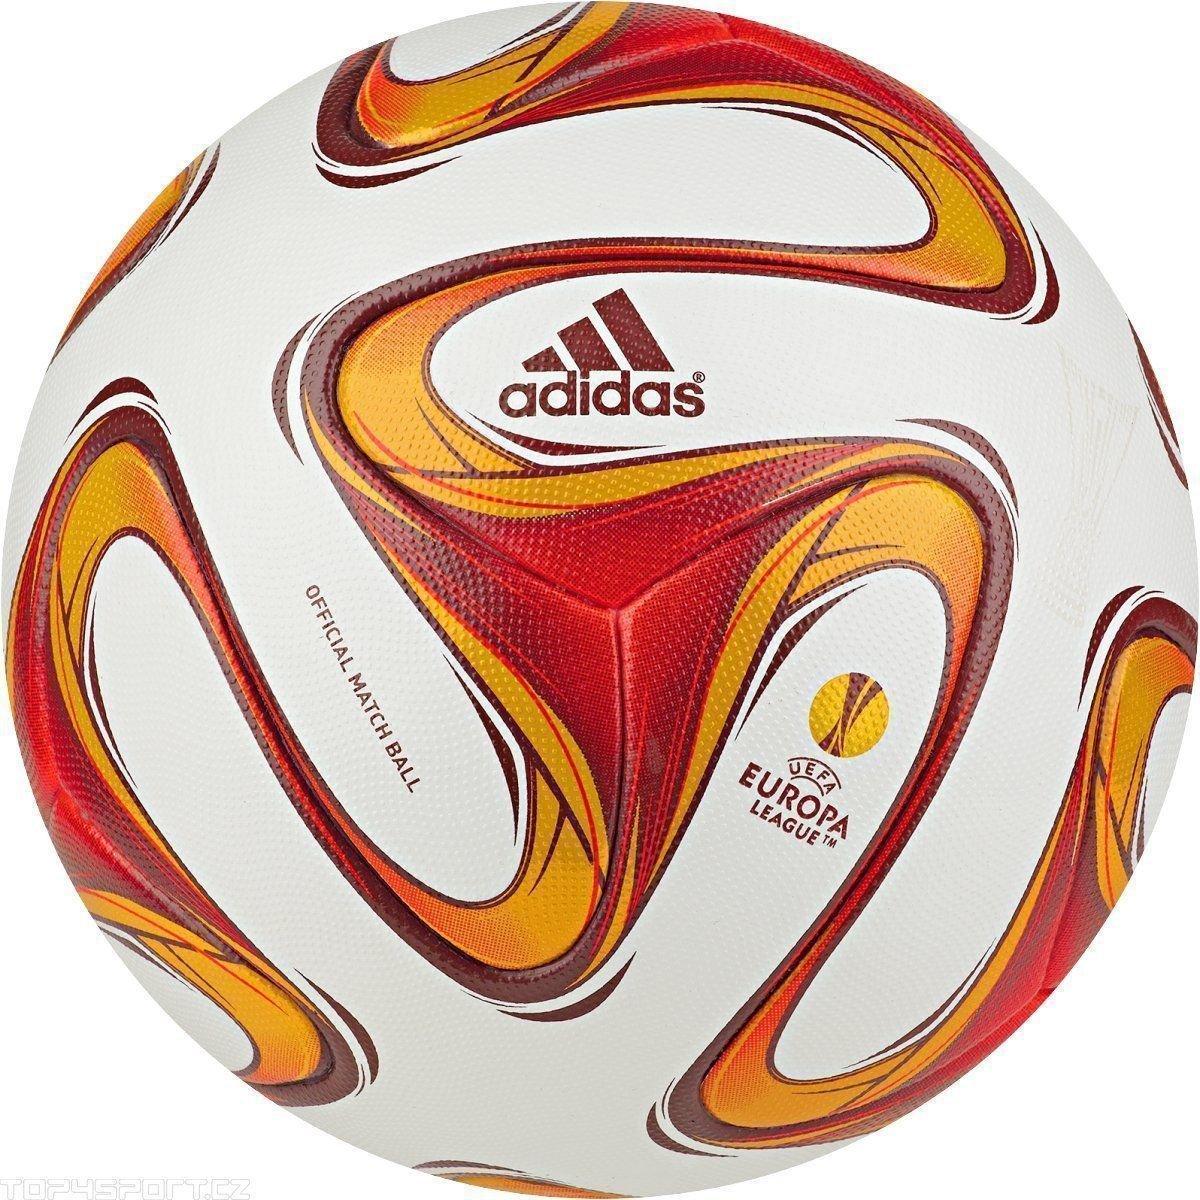 New Replica Adidas Europa League New Soccer Ball Made In Sialkot (Pakistan)